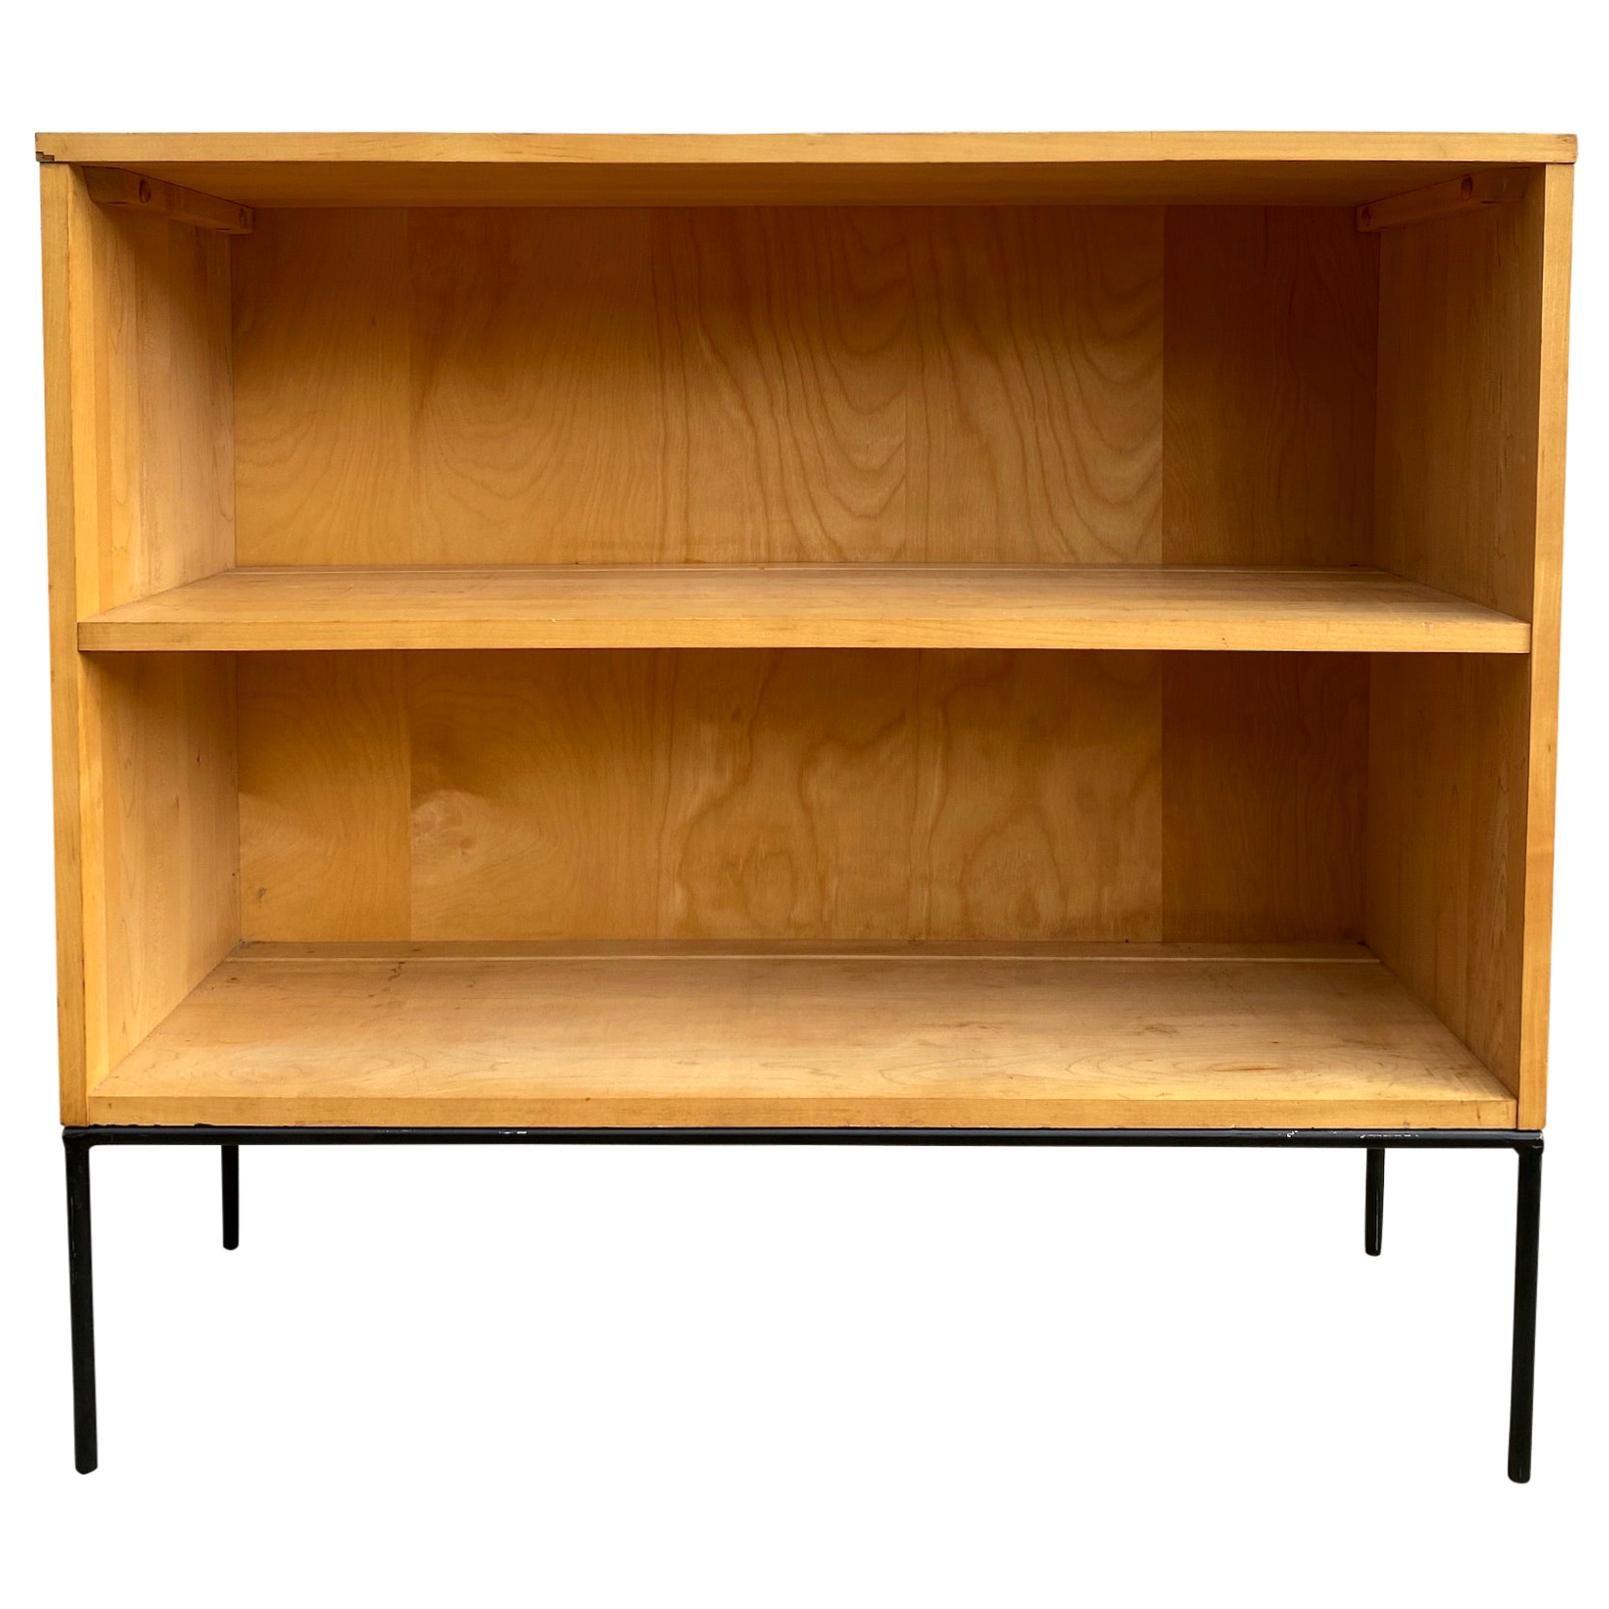 '1' Midcentury Paul McCobb Single Bookshelf #1516 Maple Iron Base Blonde